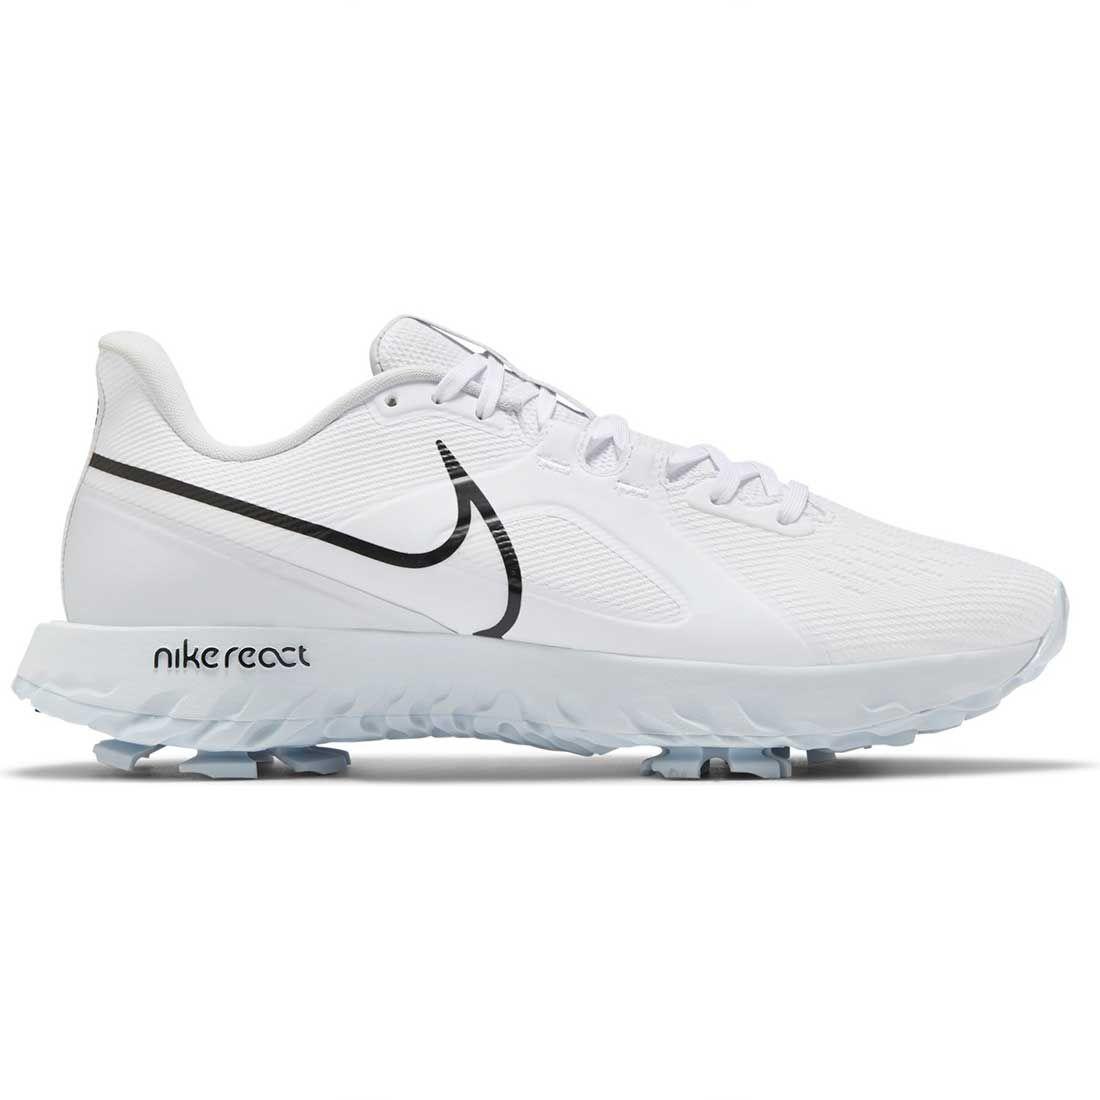 Nike React Infinity Pro Golf Shoes White/Black/Metallic